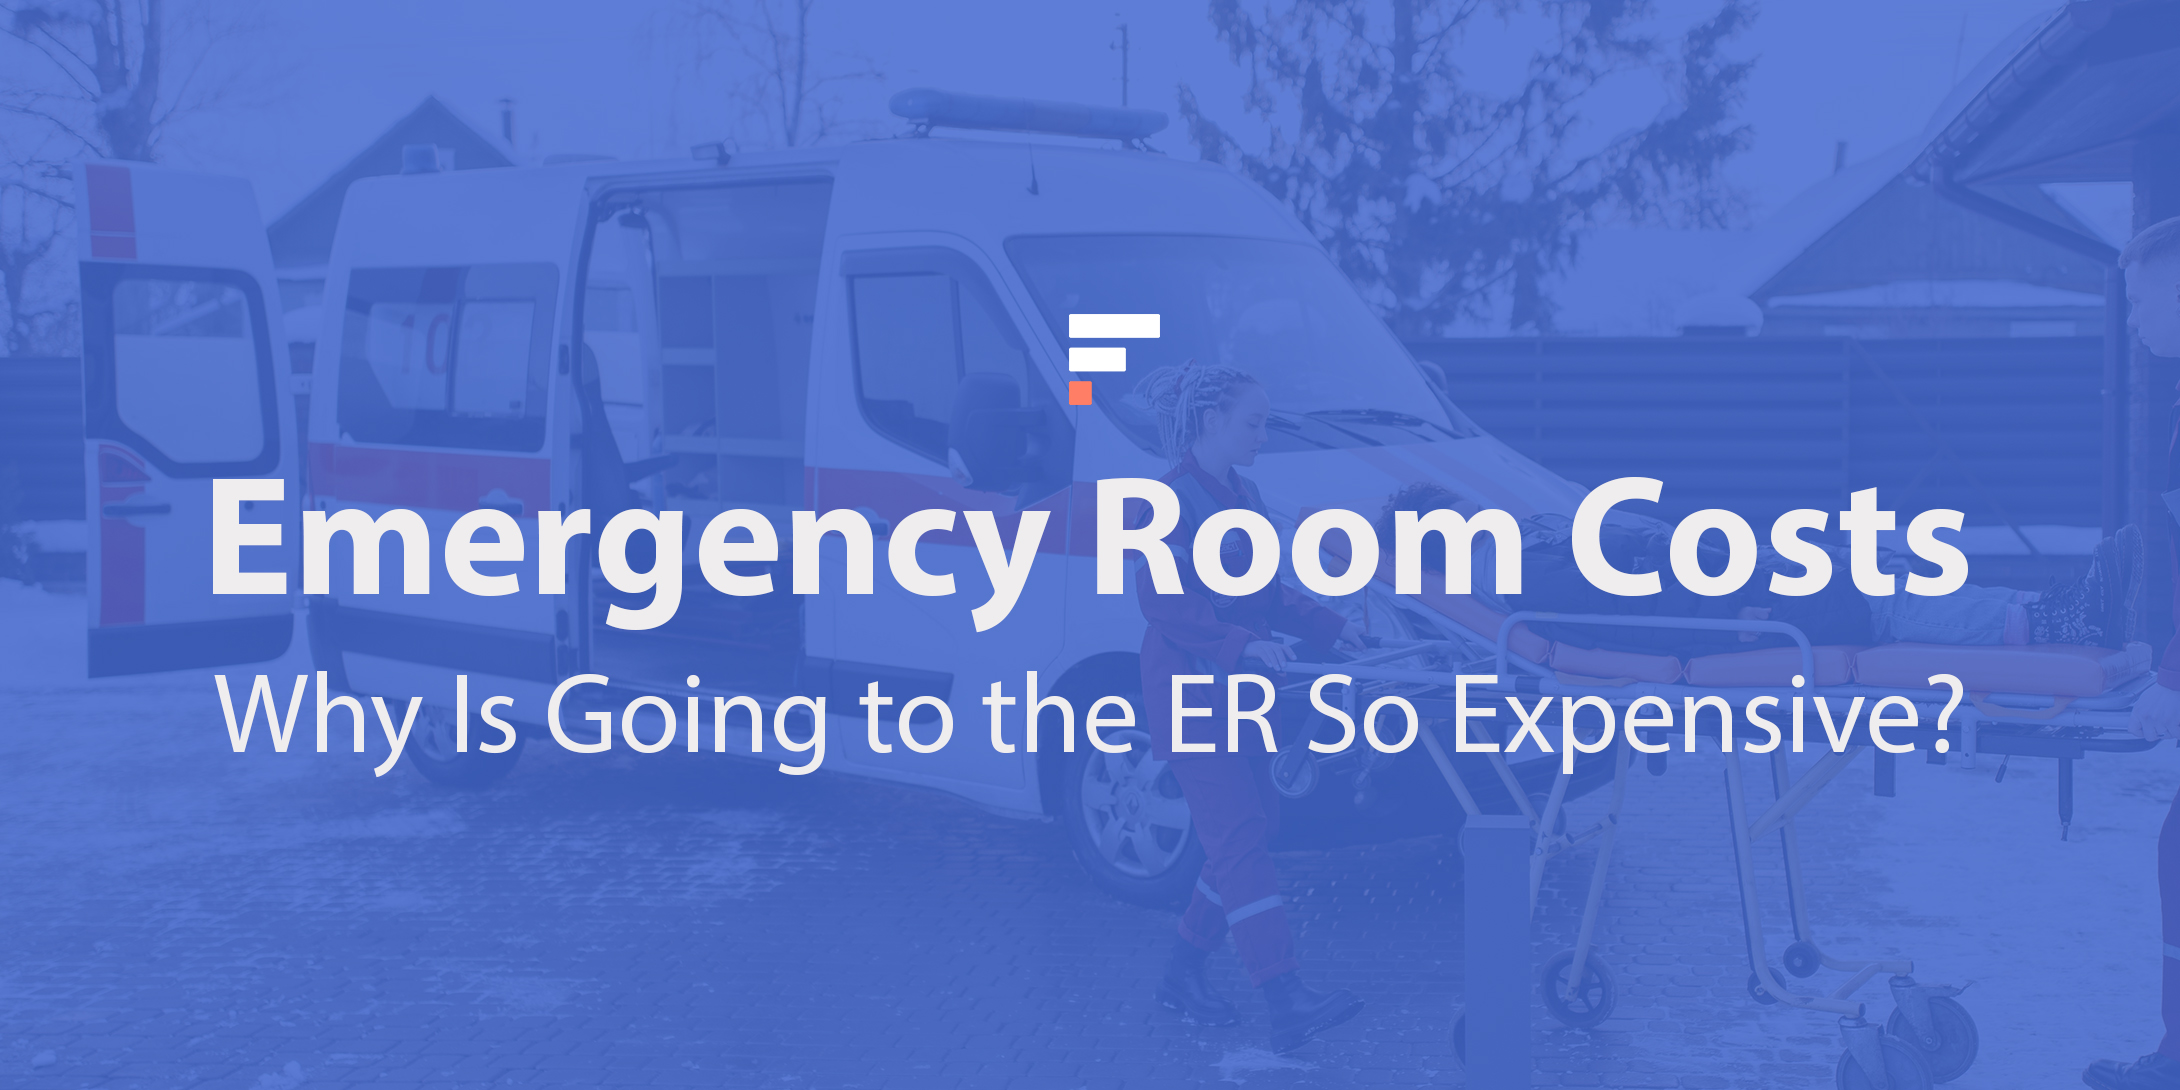 Emergency room costs